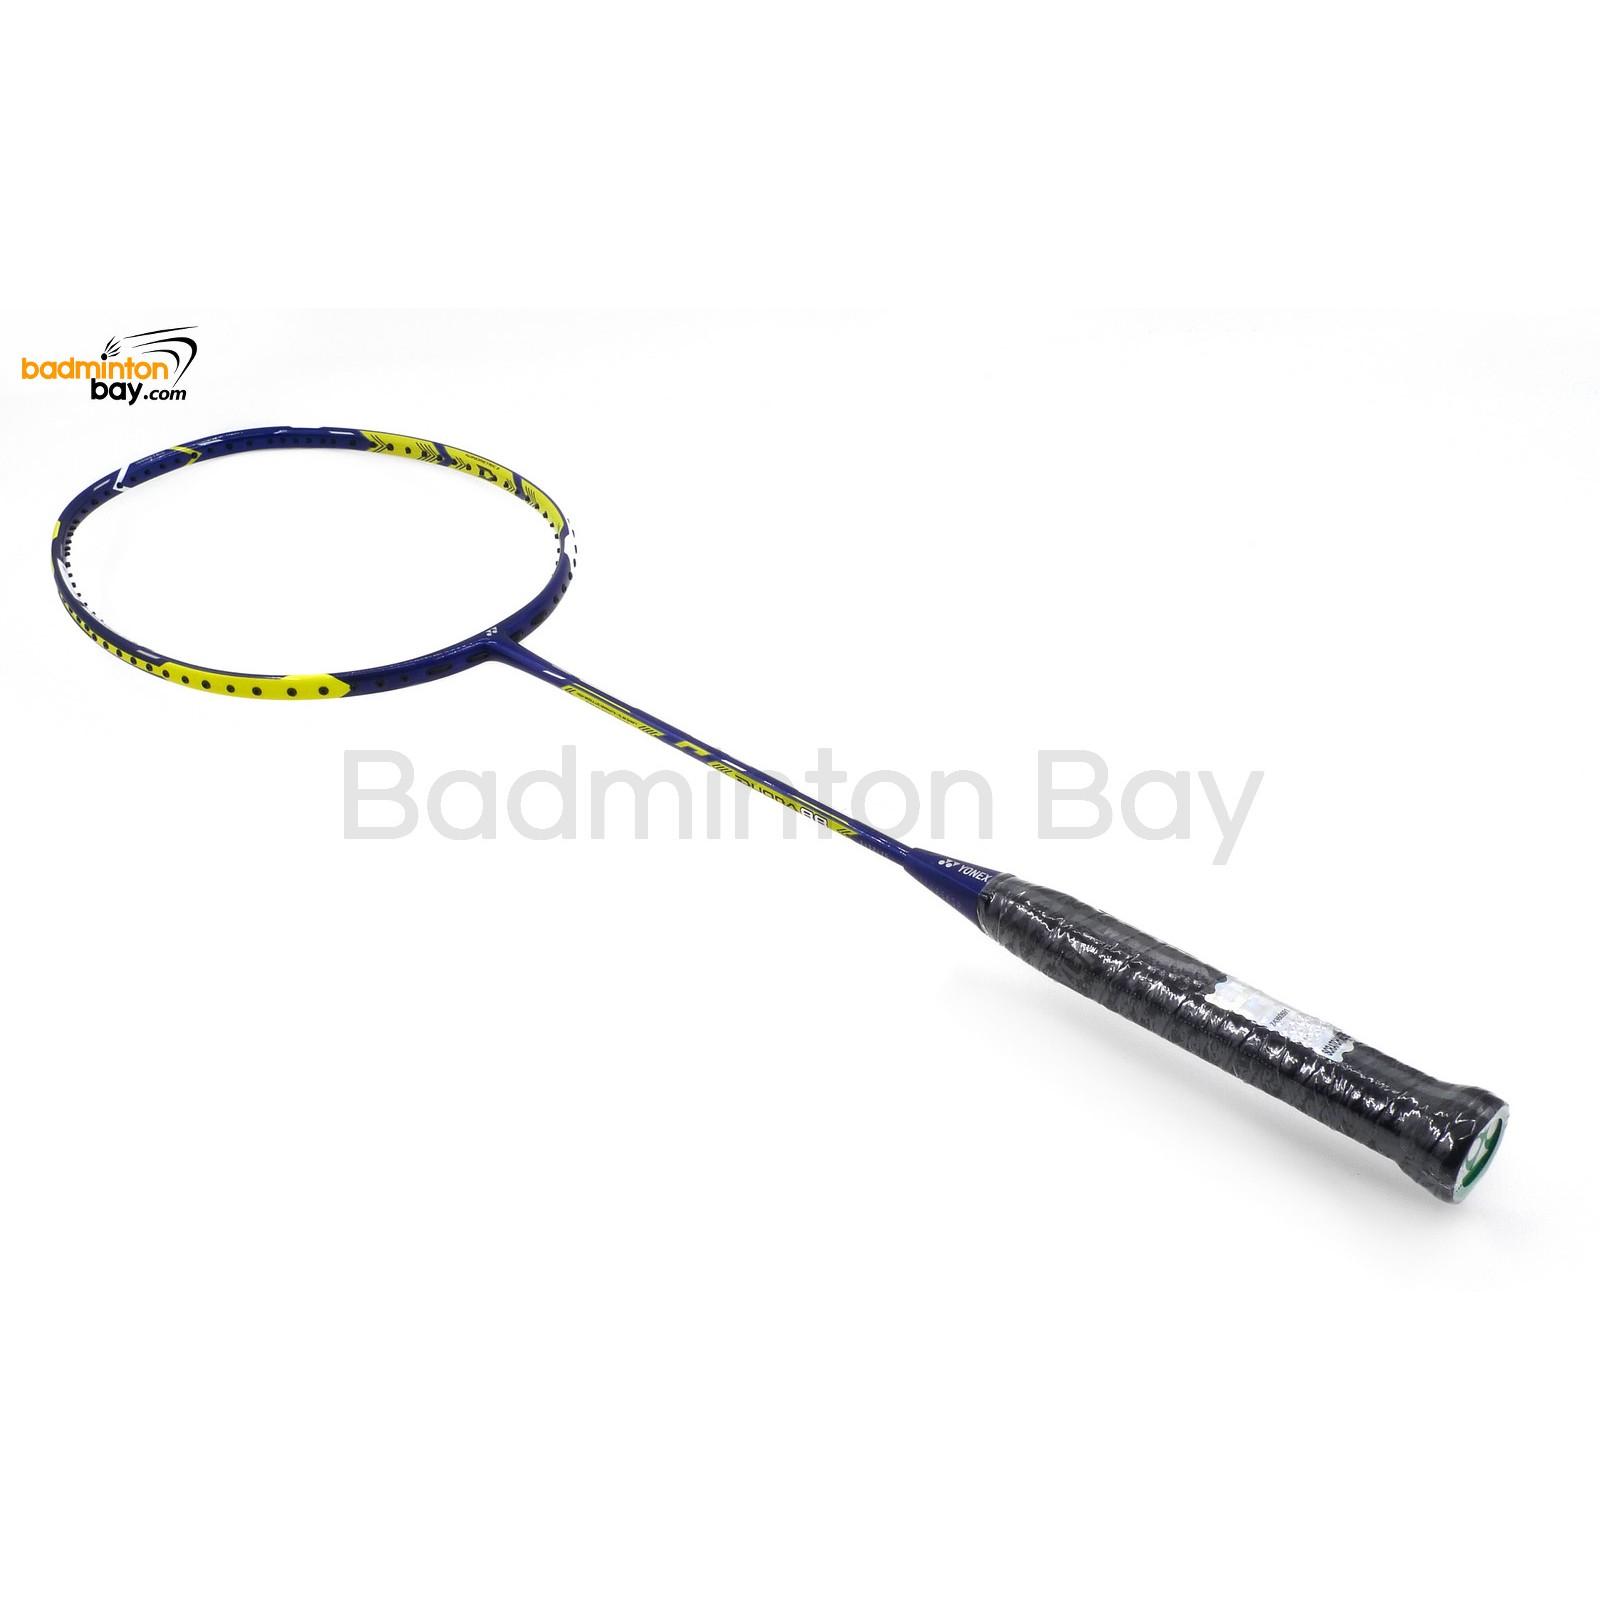 Yonex Duora 88 Badminton Racket Yellow White Blue Duora 88 3u G5